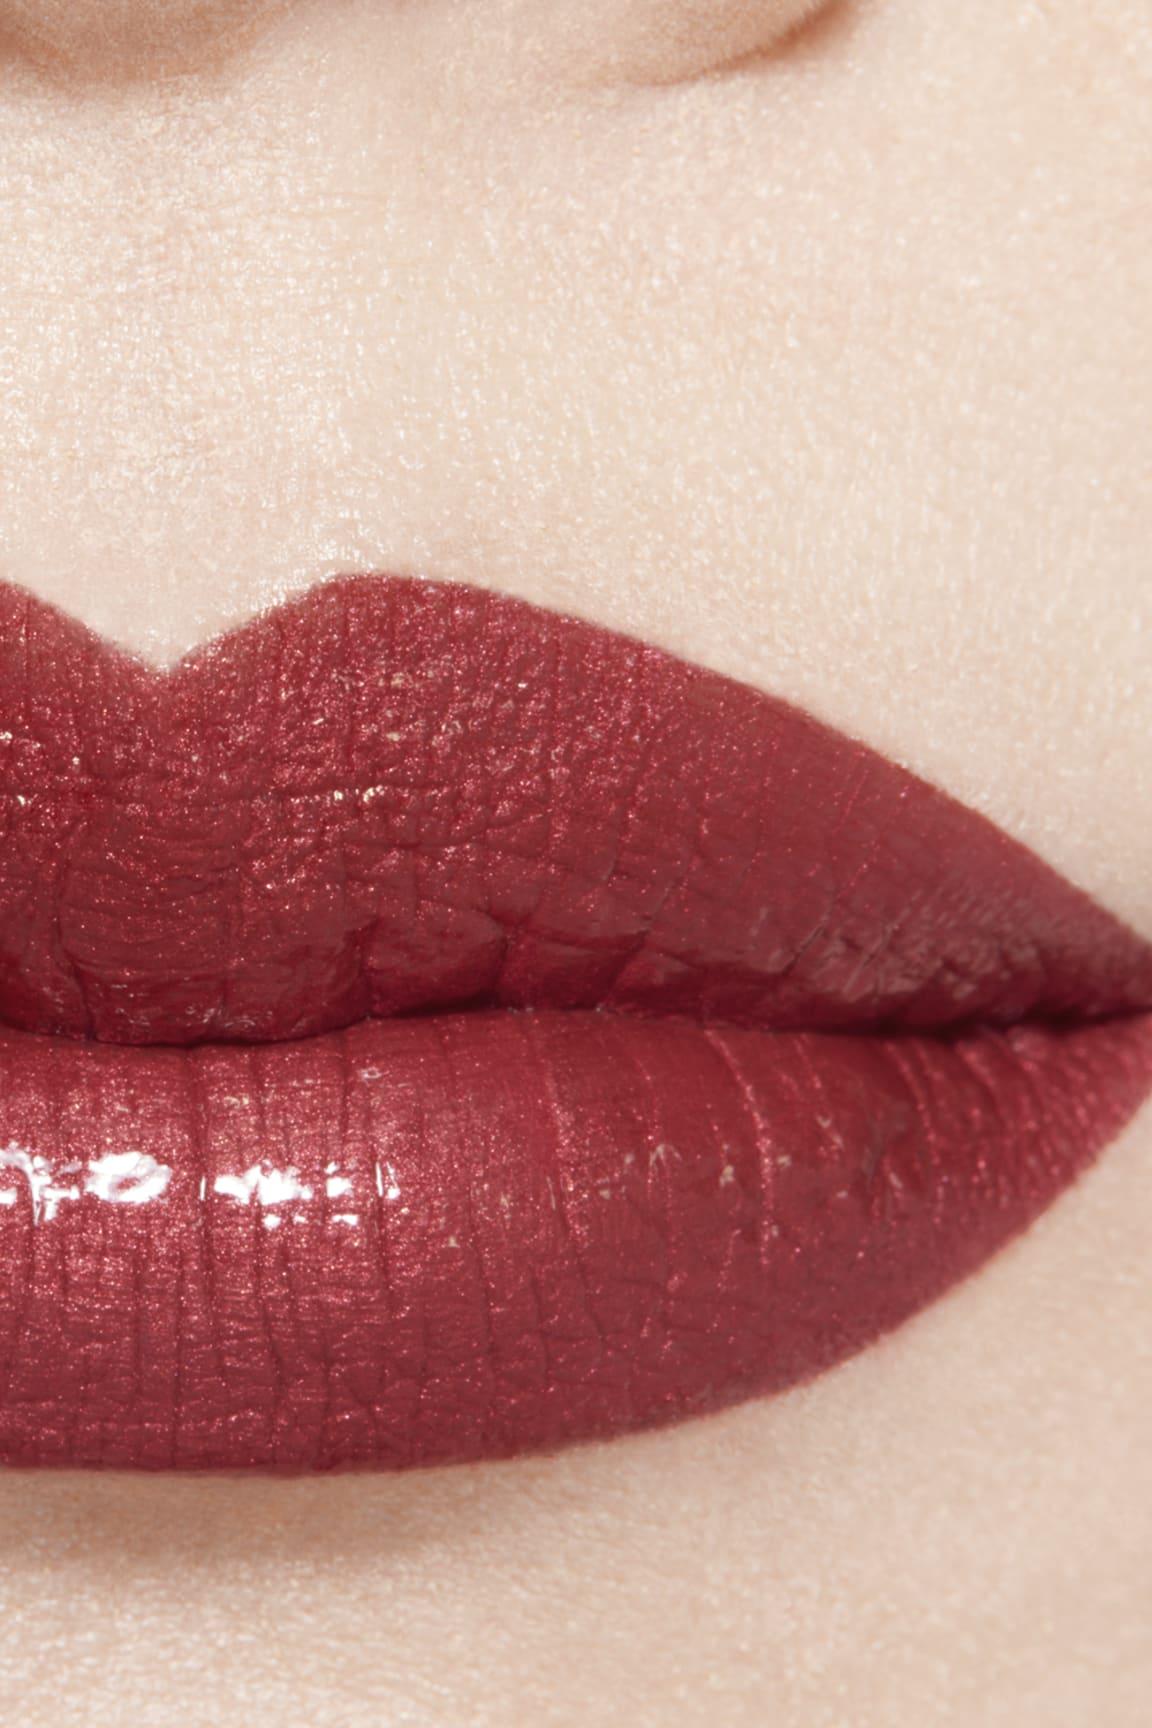 Application makeup visual 1 - ROUGE ALLURE LAQUE 84 - ROSE AMBIGU